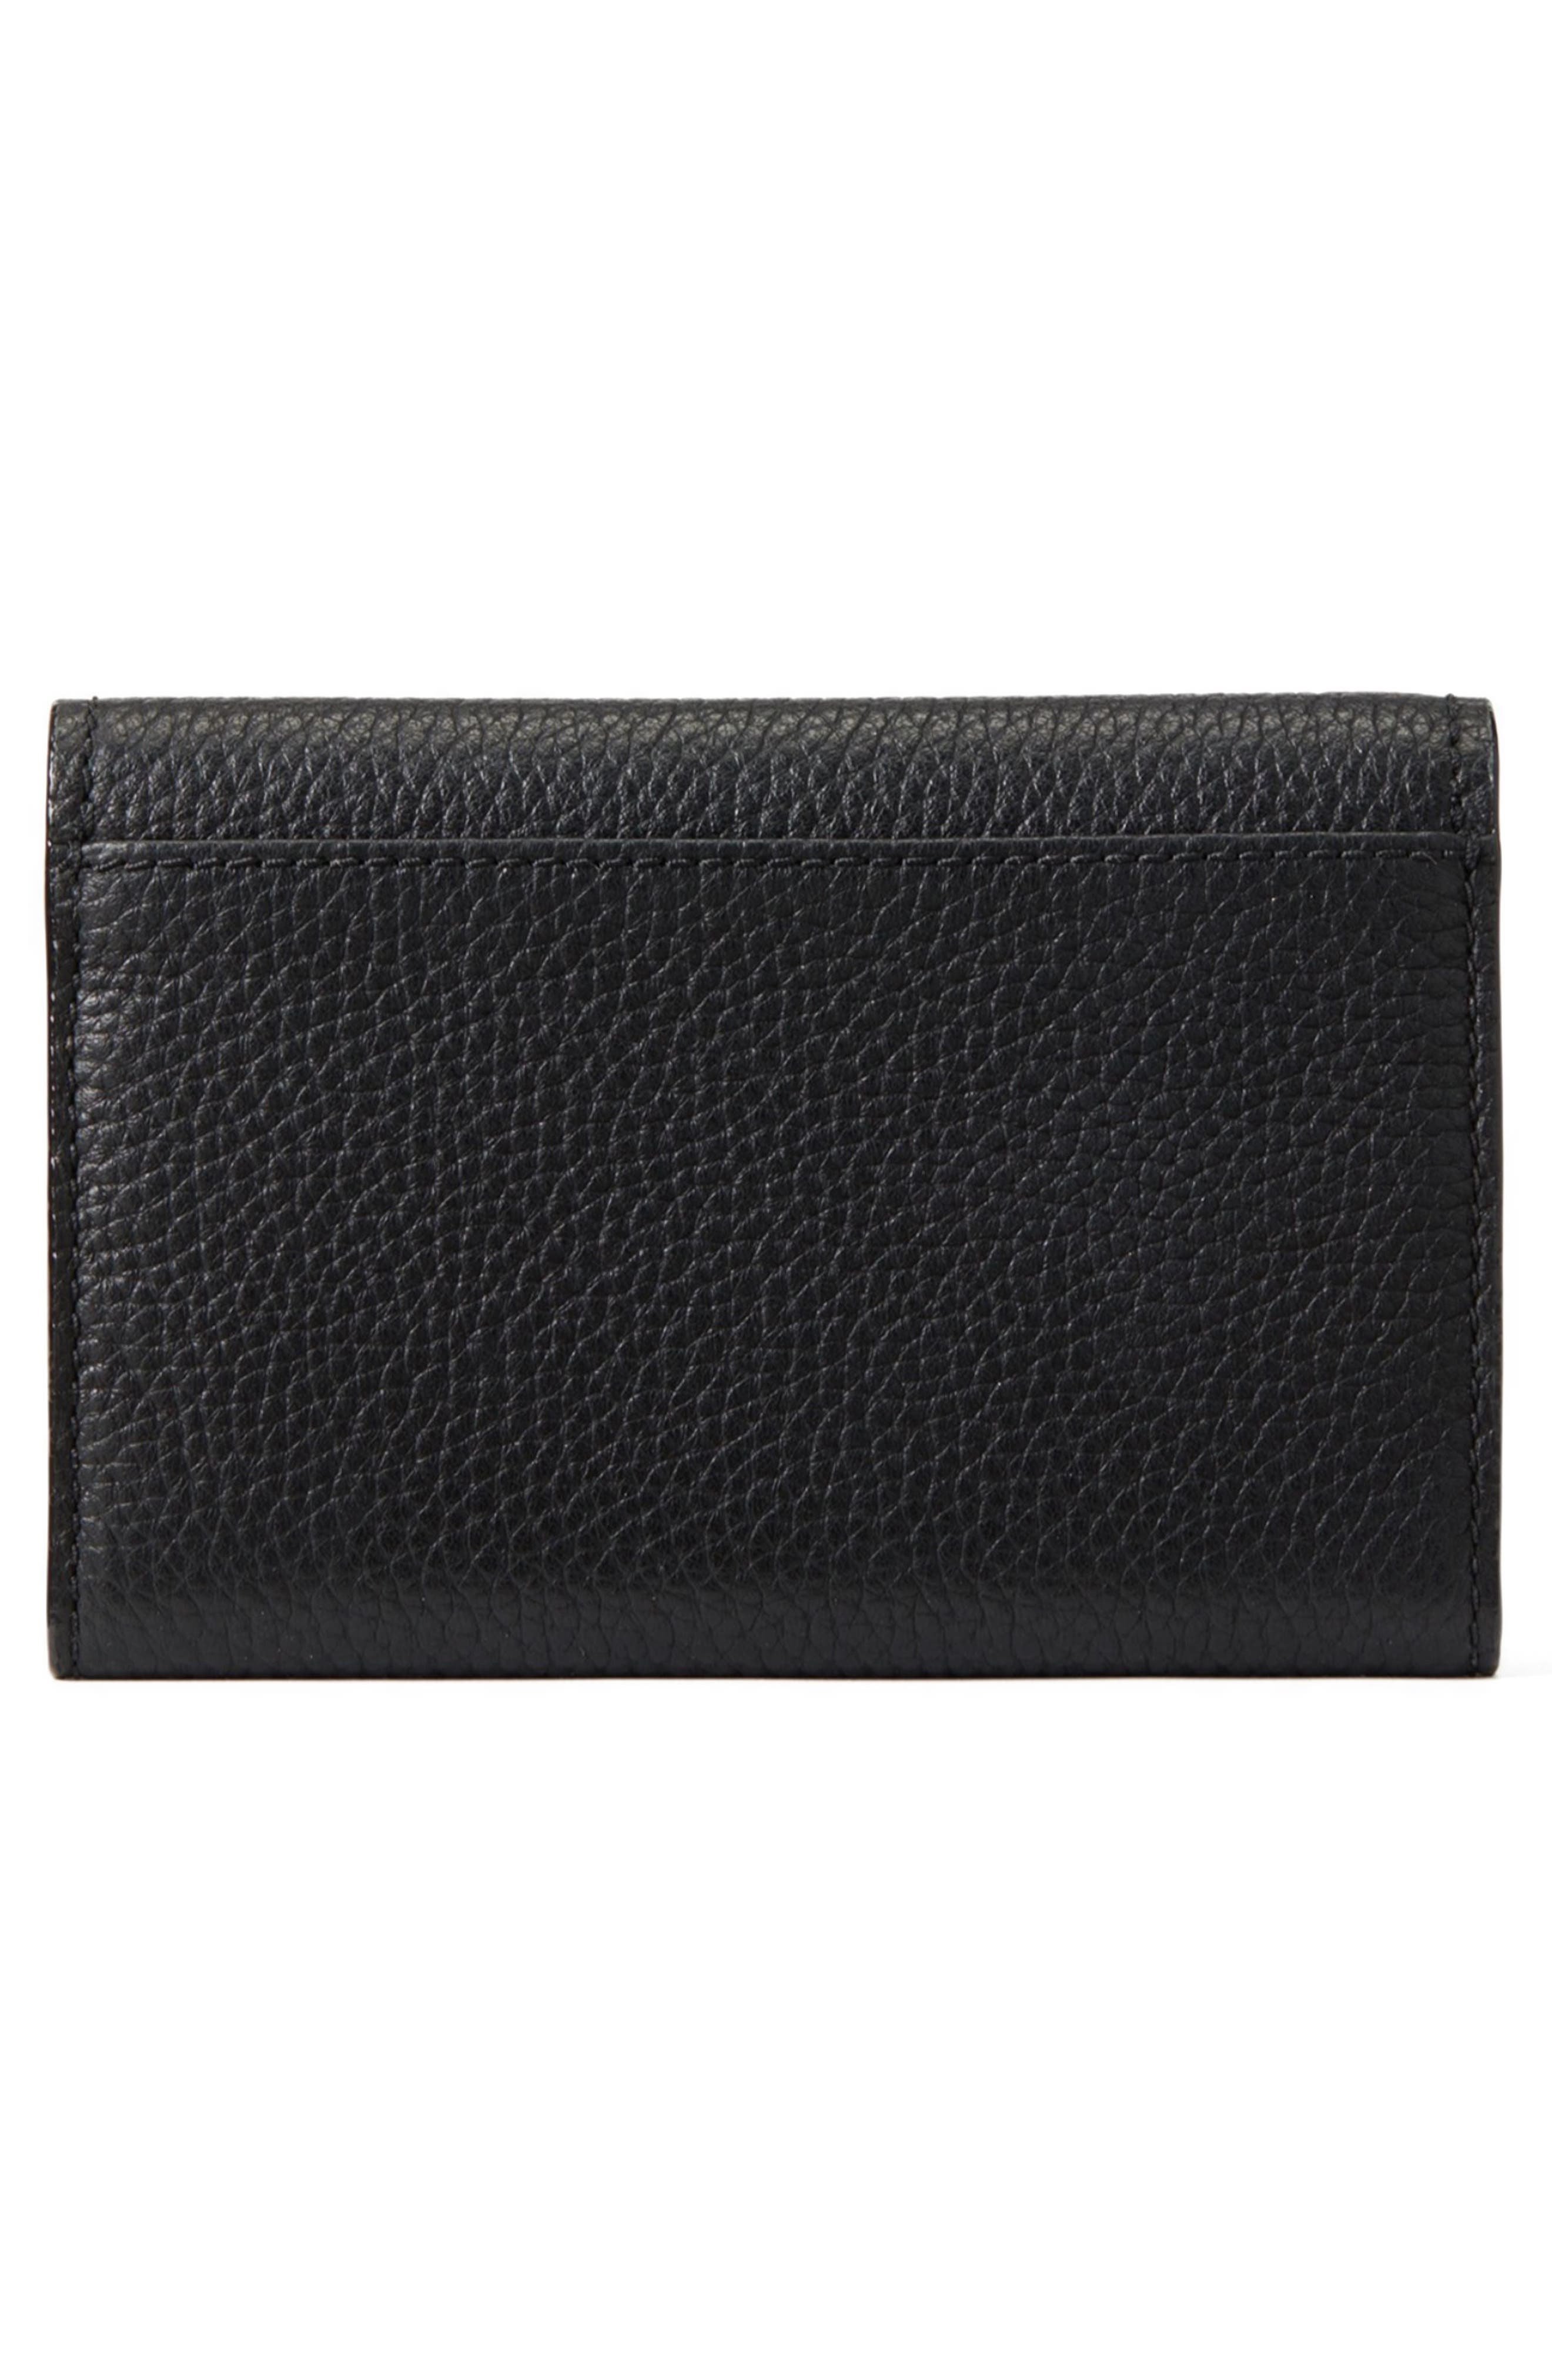 KATE SPADE NEW YORK, jackson street – meredith leather wallet, Alternate thumbnail 4, color, 001